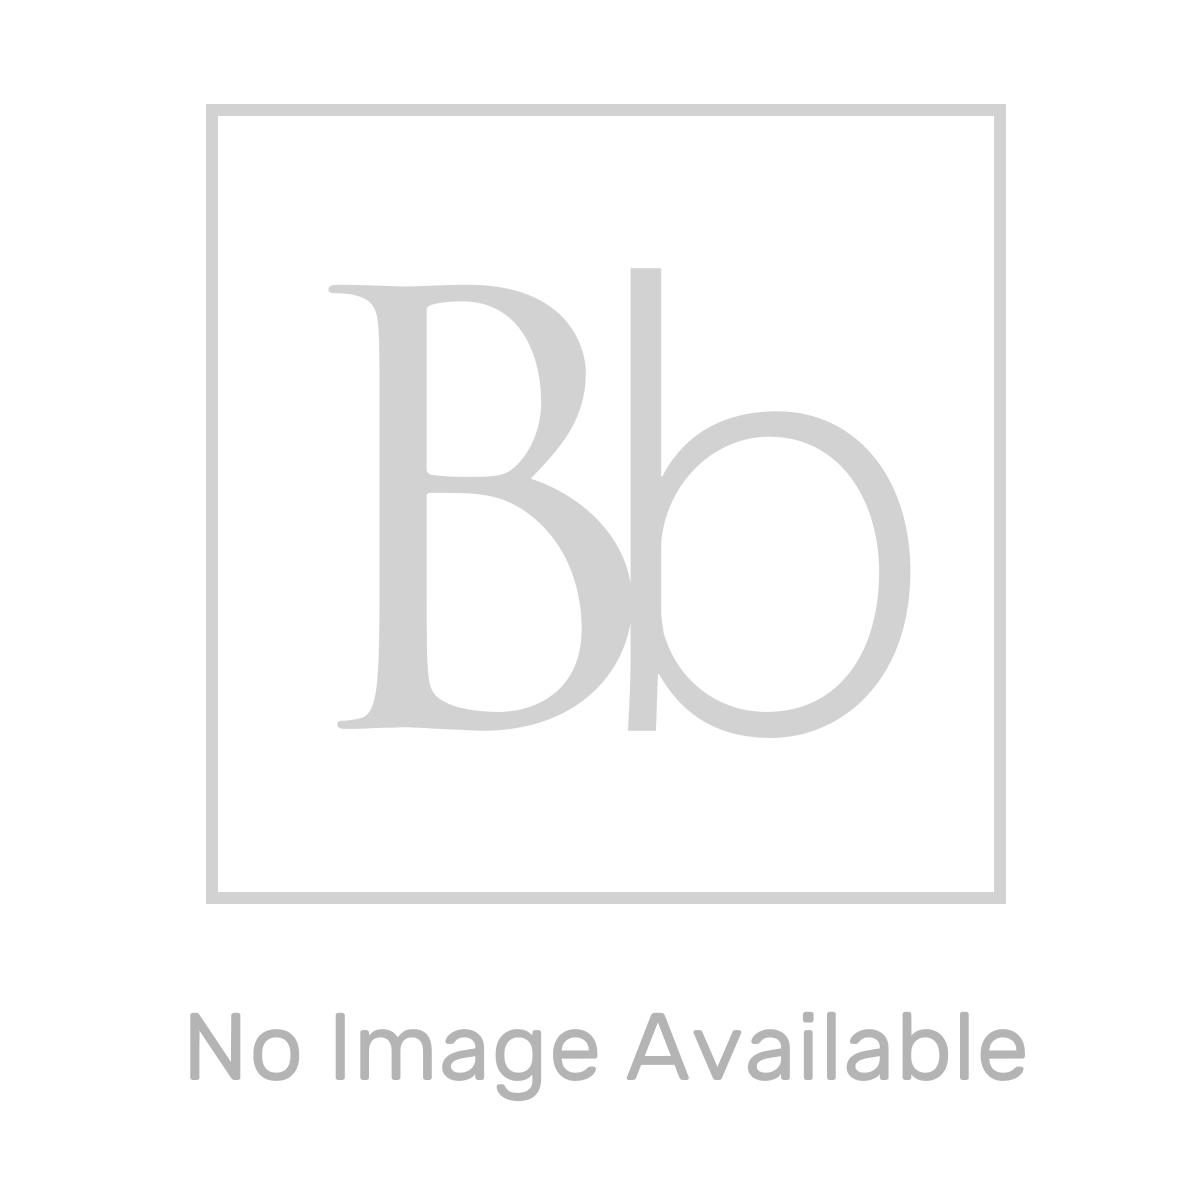 Elation Ikoma Bodega Grey Mirror Unit 650mm Dimensions